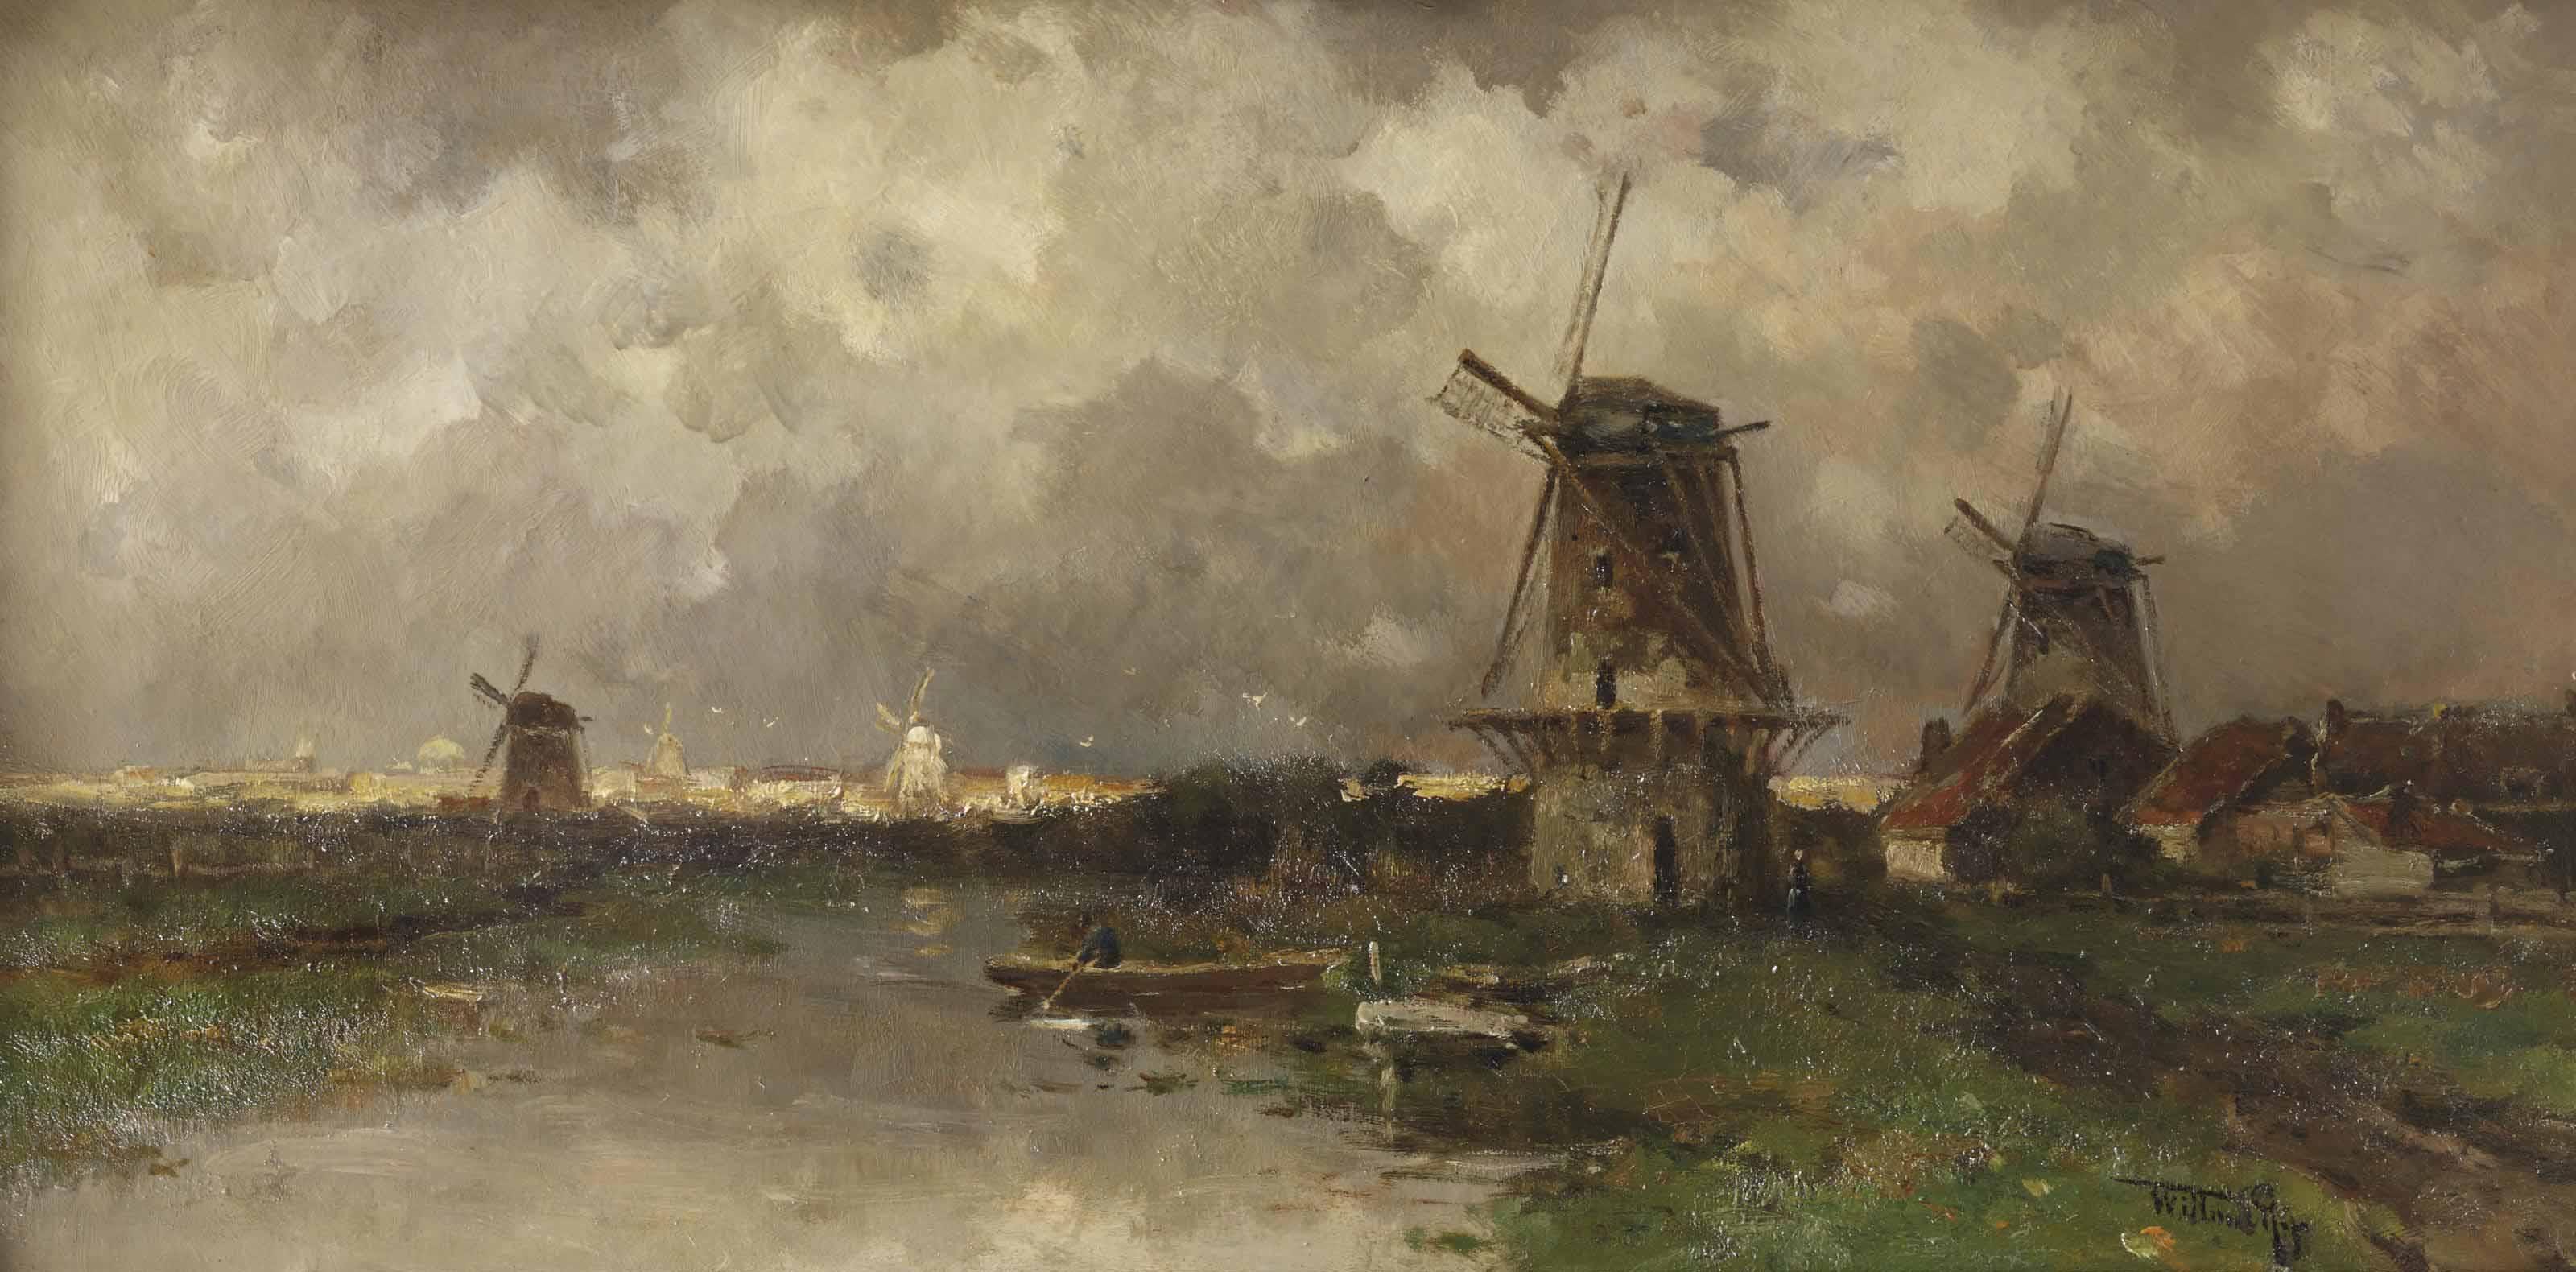 Willem Cornelis Rip (1856-1922